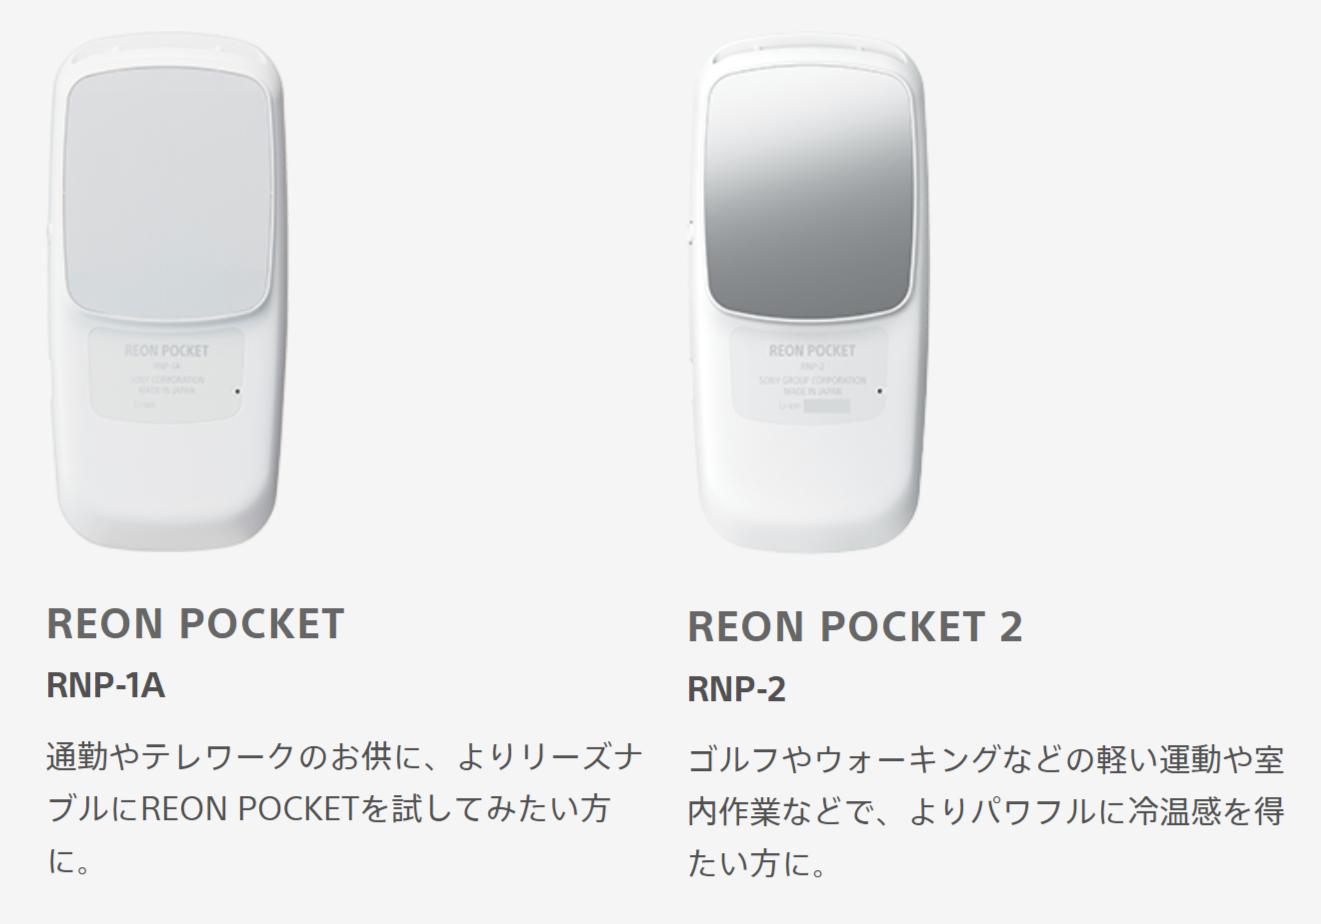 reon pocket